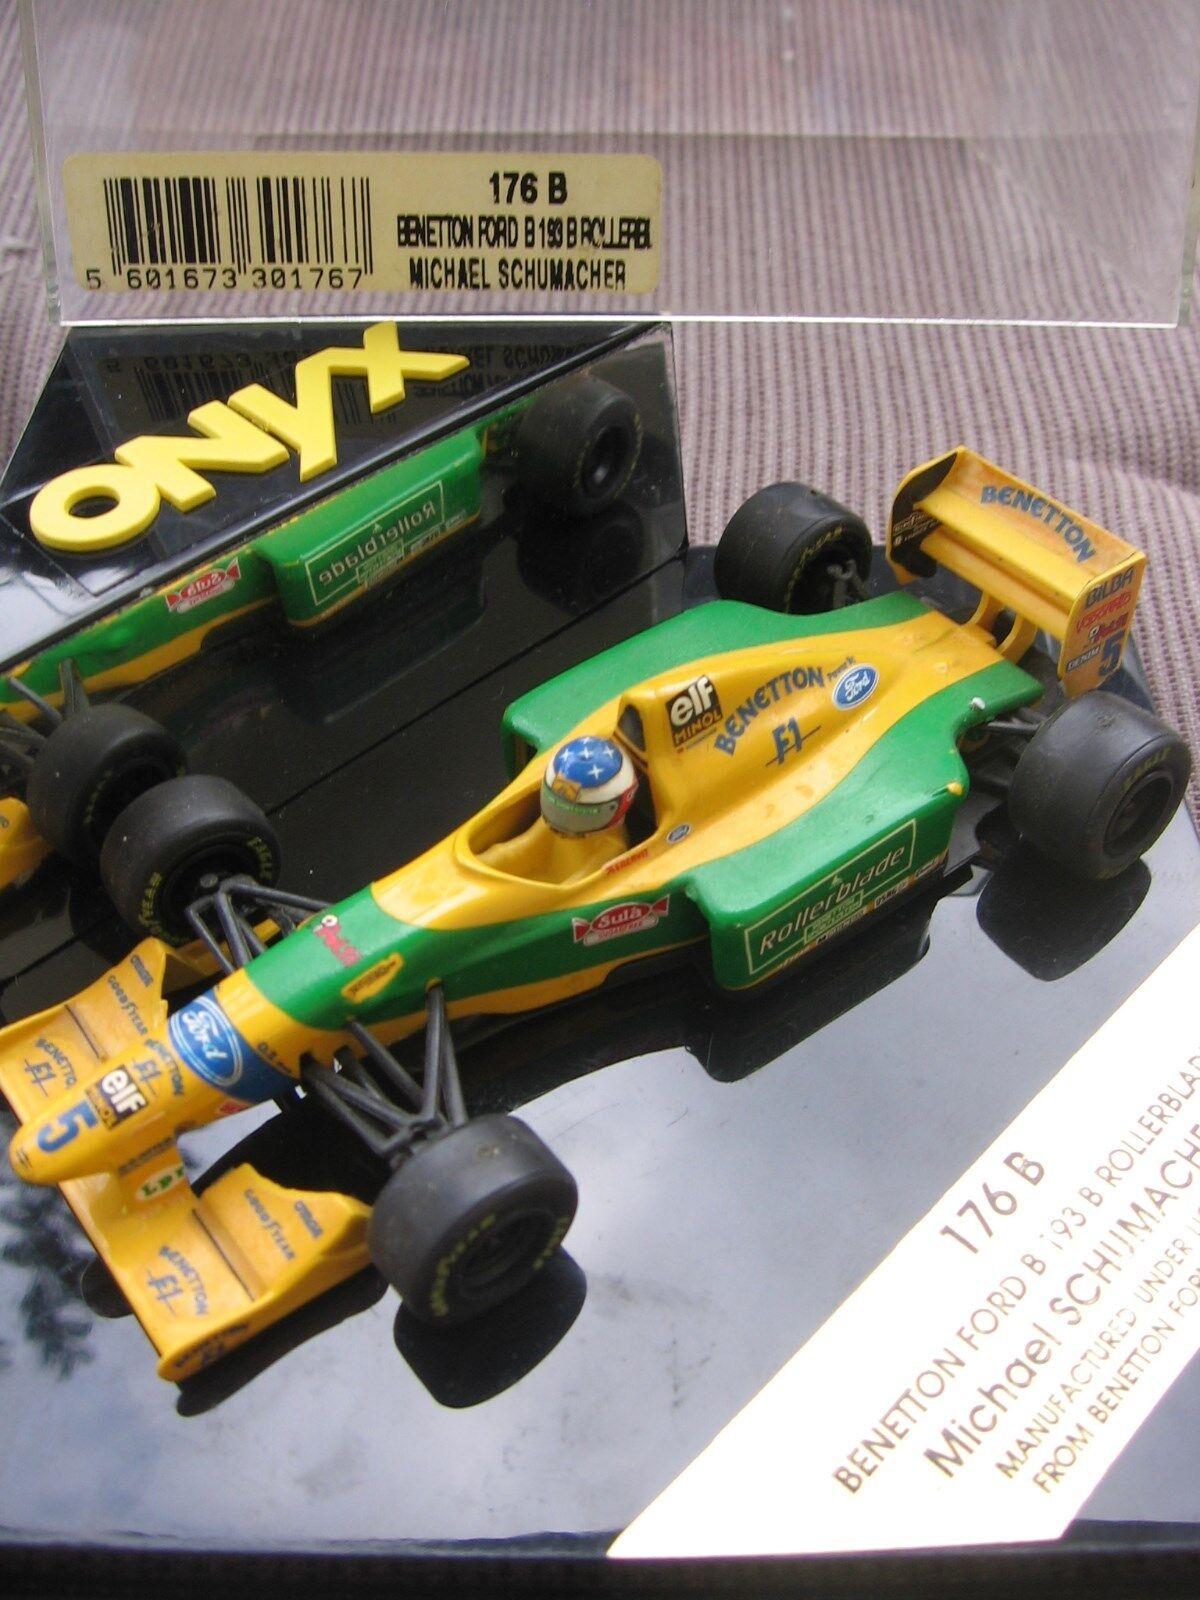 MSC Schumacher f1 BENETTON BENETTON BENETTON FORD b193b pattini in linea 1993 1 43 OVP  87512b